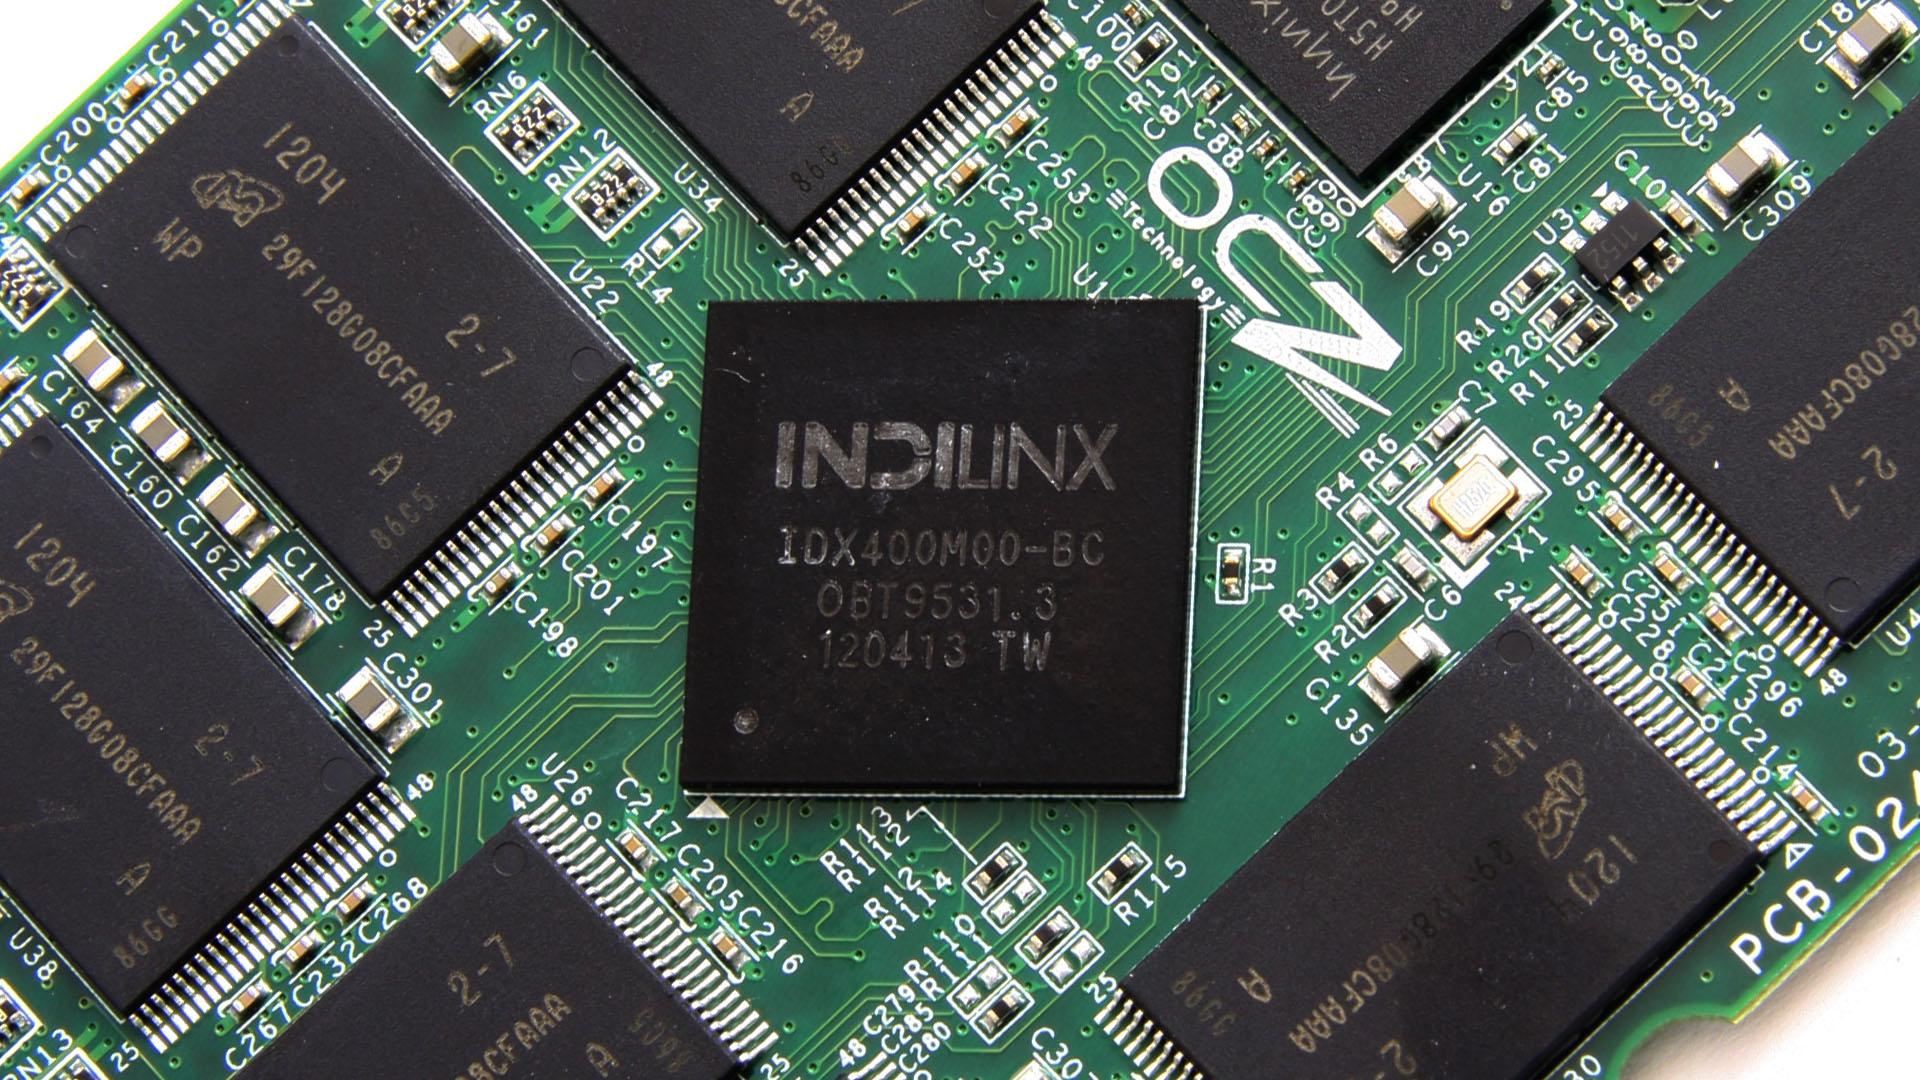 indilinx_everest2